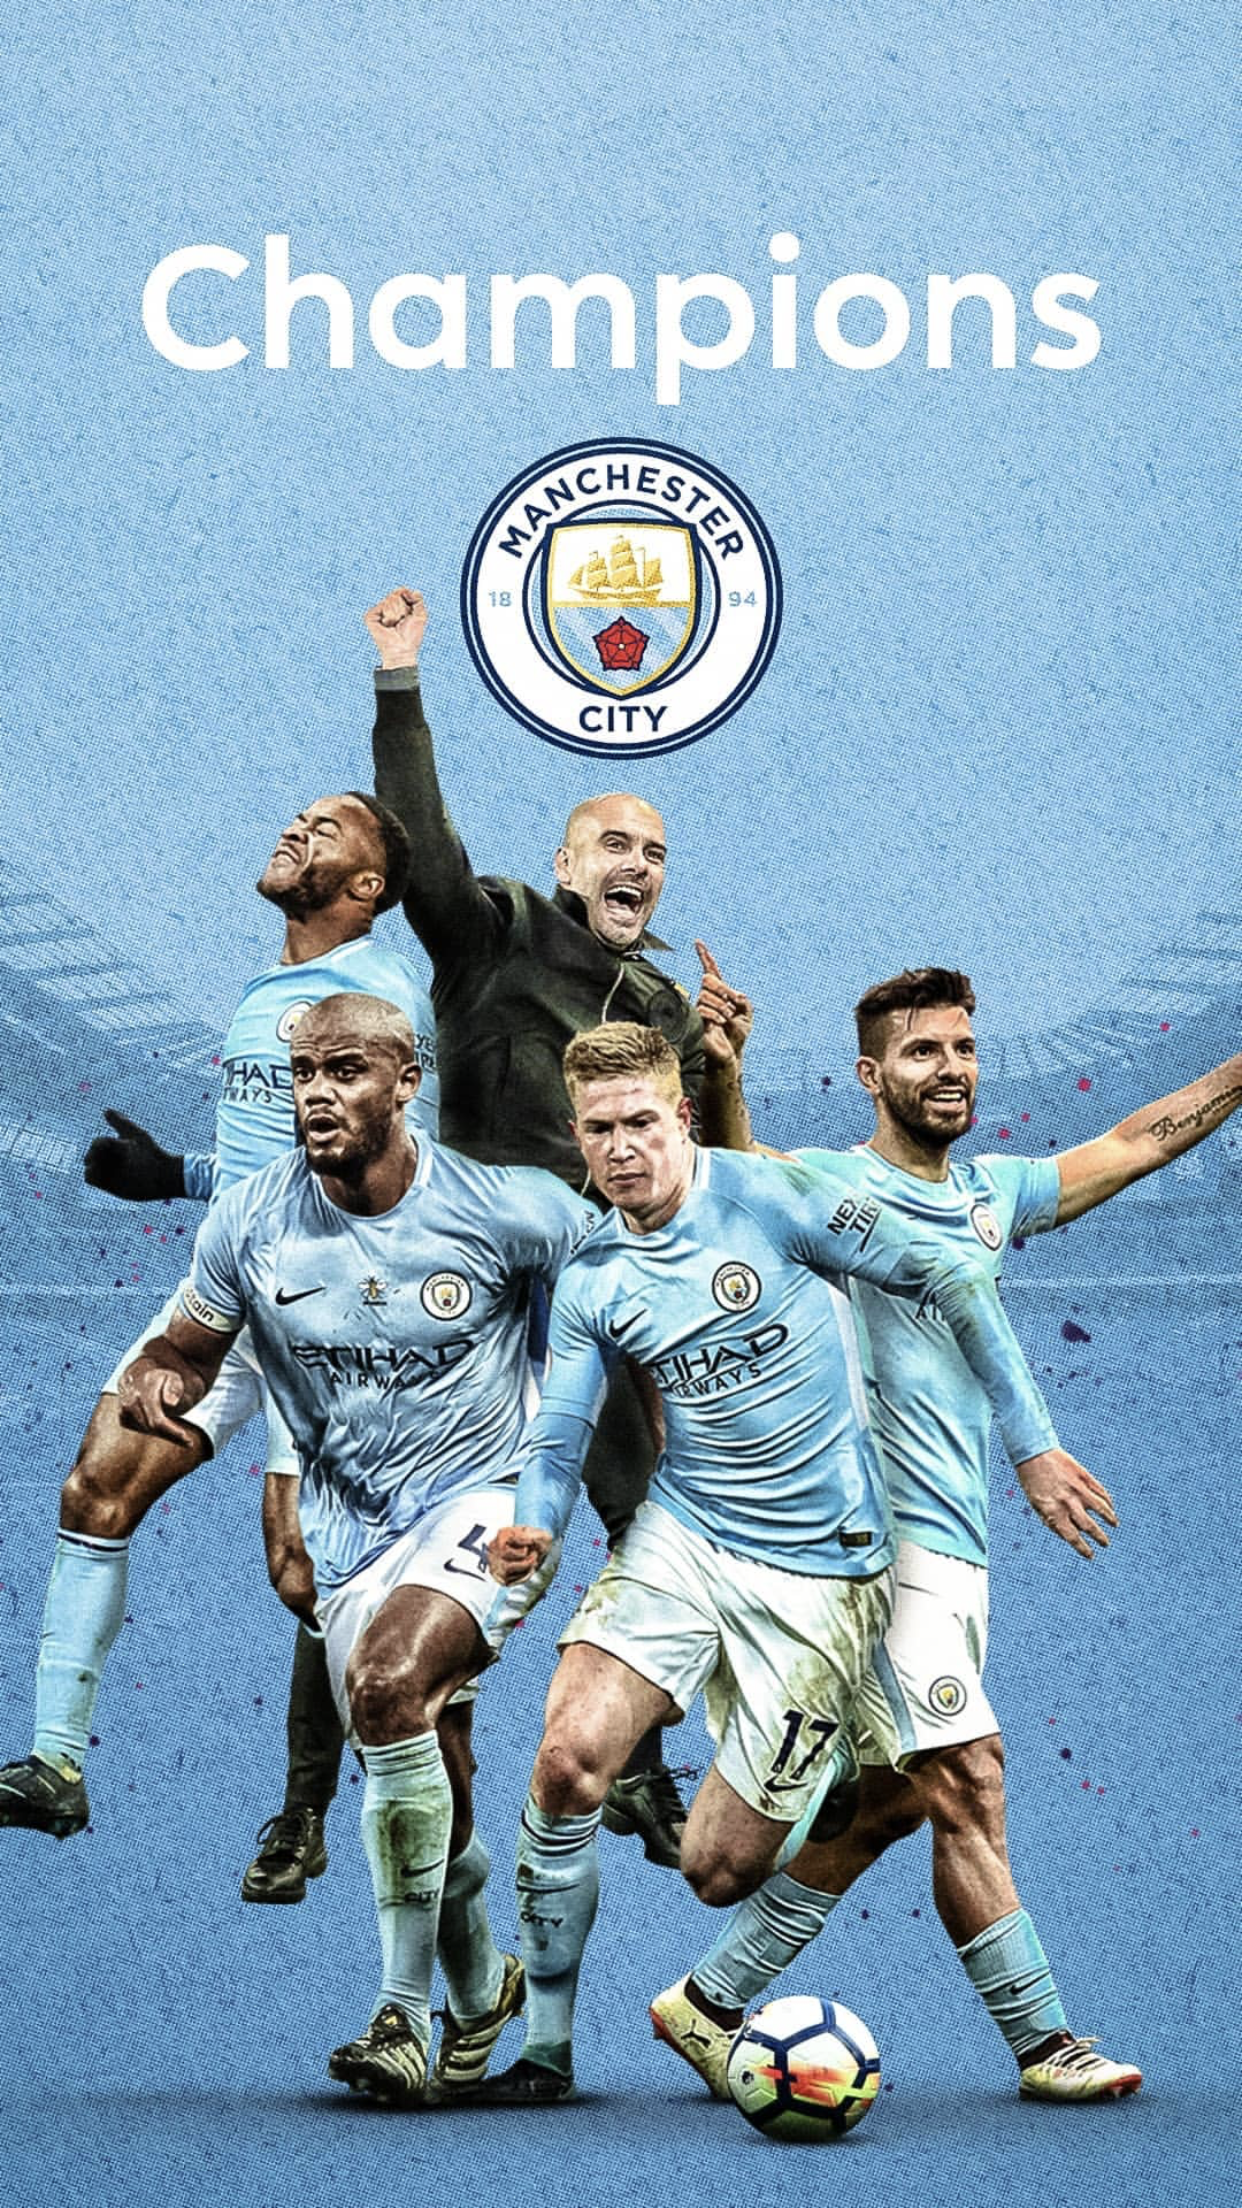 Mancity Manchestercity Champions Premierleague Wallpaper Football Manchester Ci Manchester City Wallpaper Manchester City Manchester City Football Club